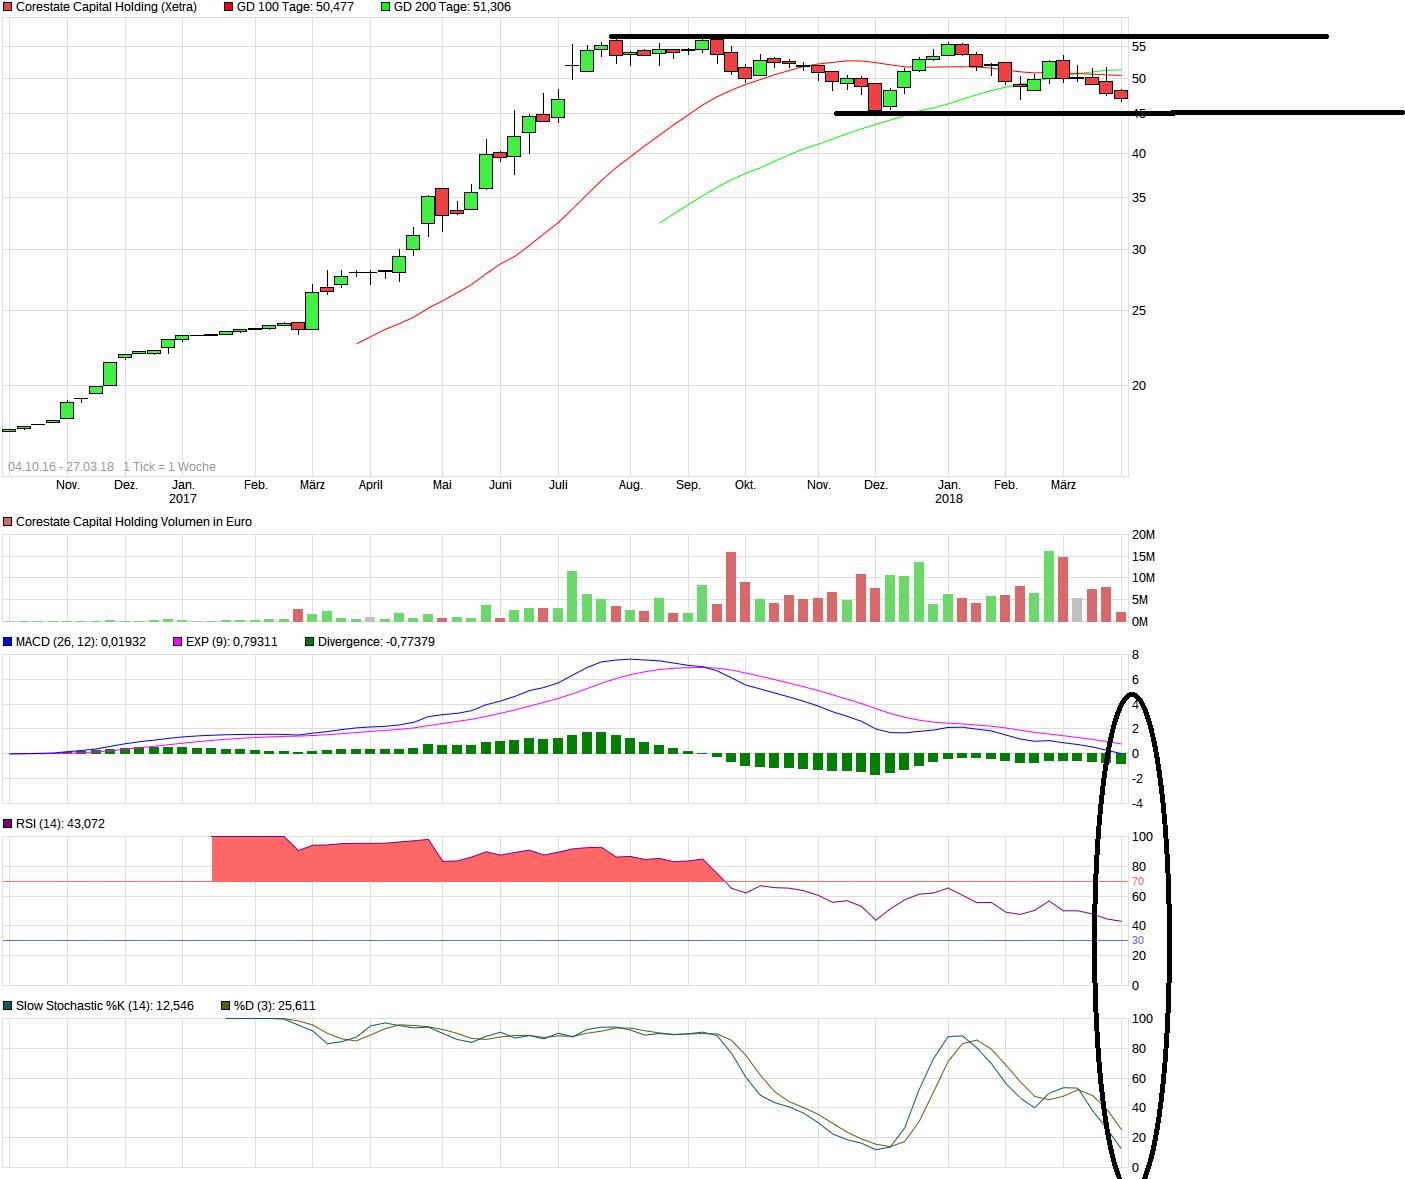 chart_3years_corestatecapitalholding.png